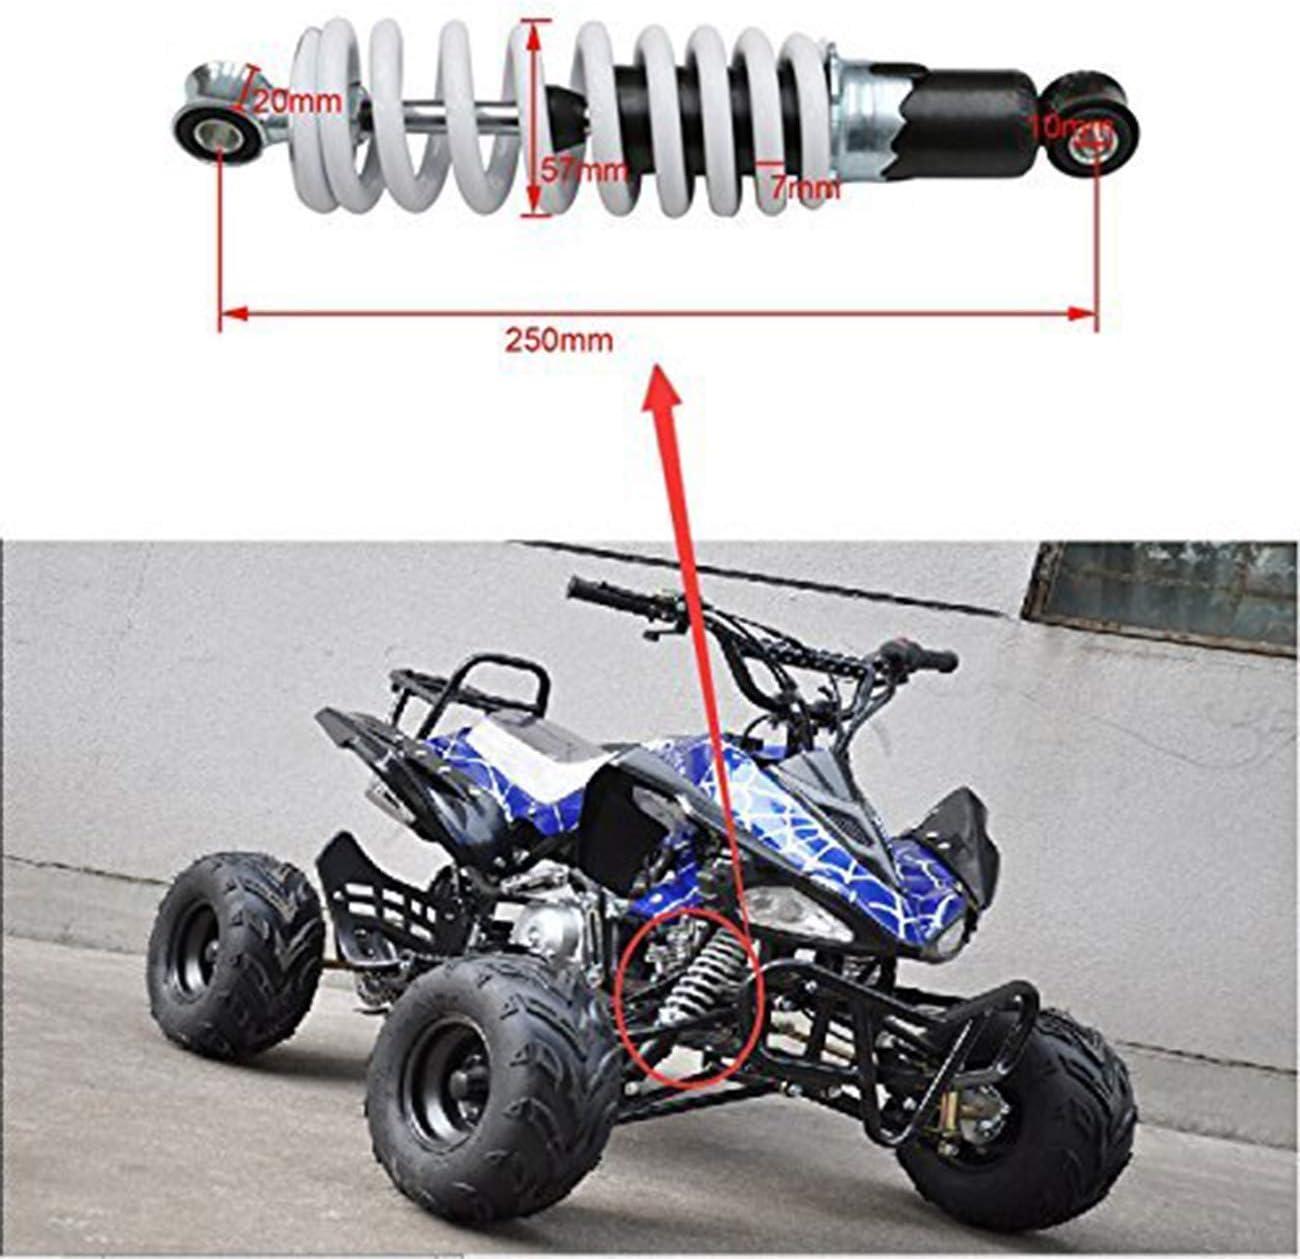 Fuerduo 1PCS 9 7//8 250mm Rear Spring Assist Load Carrier Shocks for ATV Go Kart Quad Bike 4 Wheeler